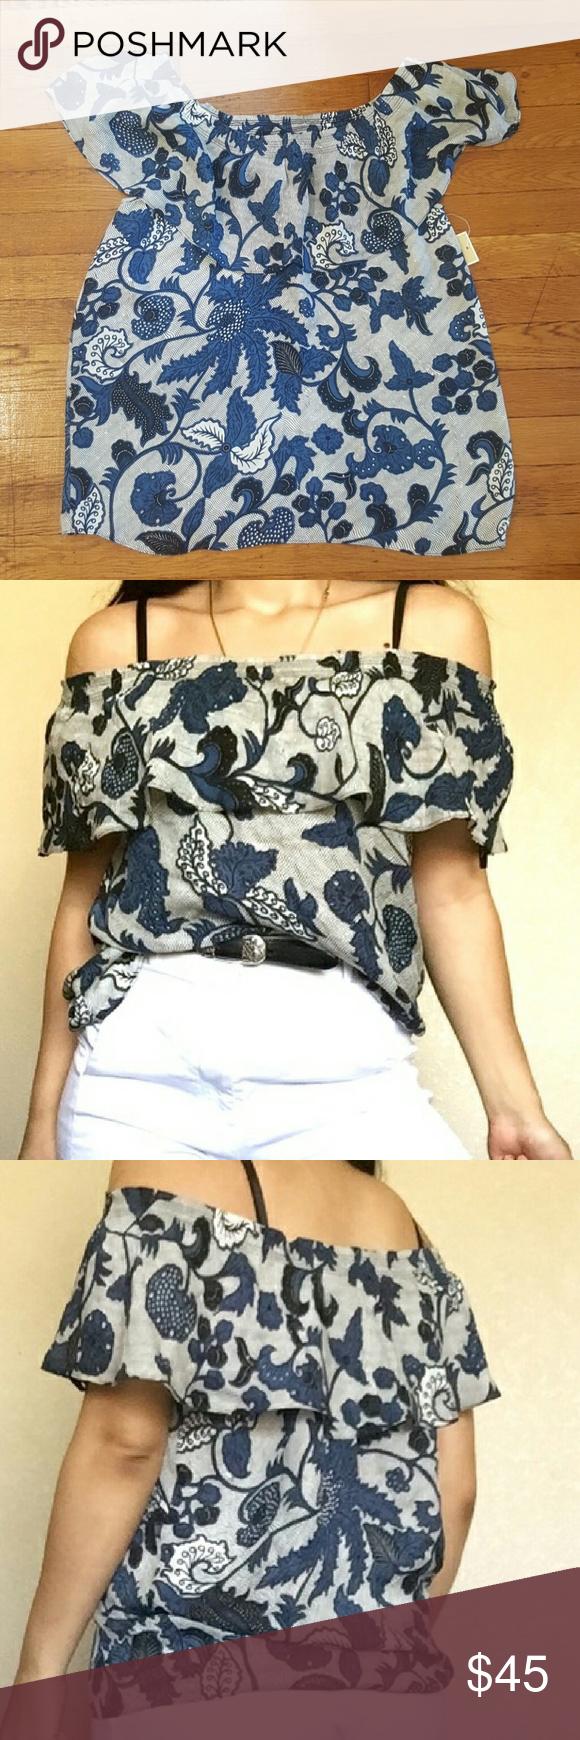 Michael Kors silk blouse Beautiful silk off the shoulders blouse Michael Kors Tops Blouses